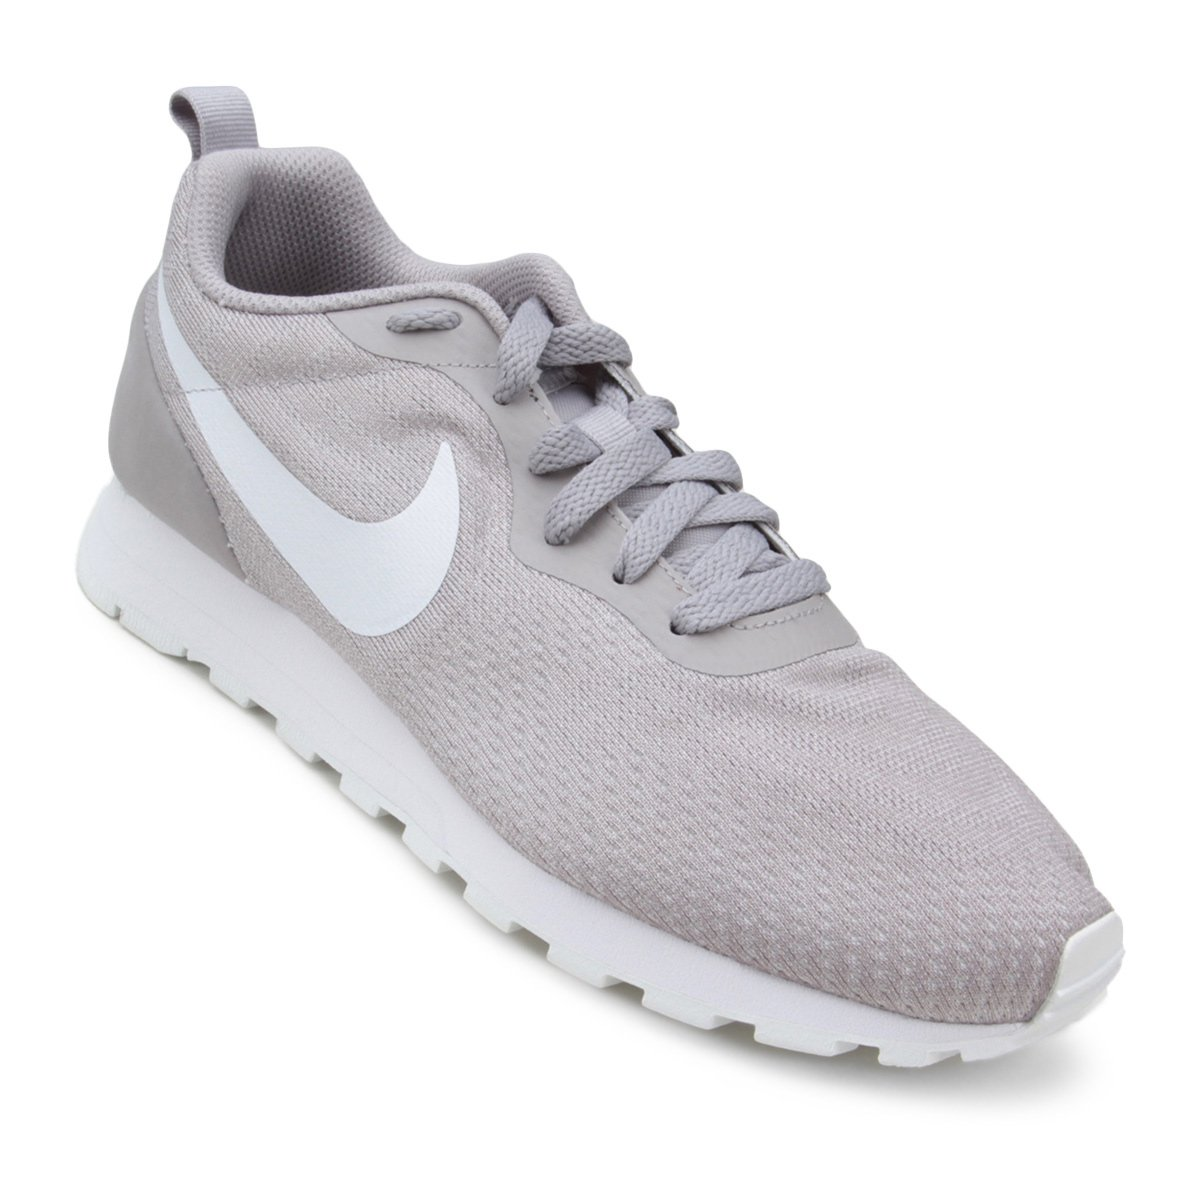 64516422bf436 Tênis Nike Md Runner 2 Eng Mesh Feminino - Cinza - Compre Agora ...